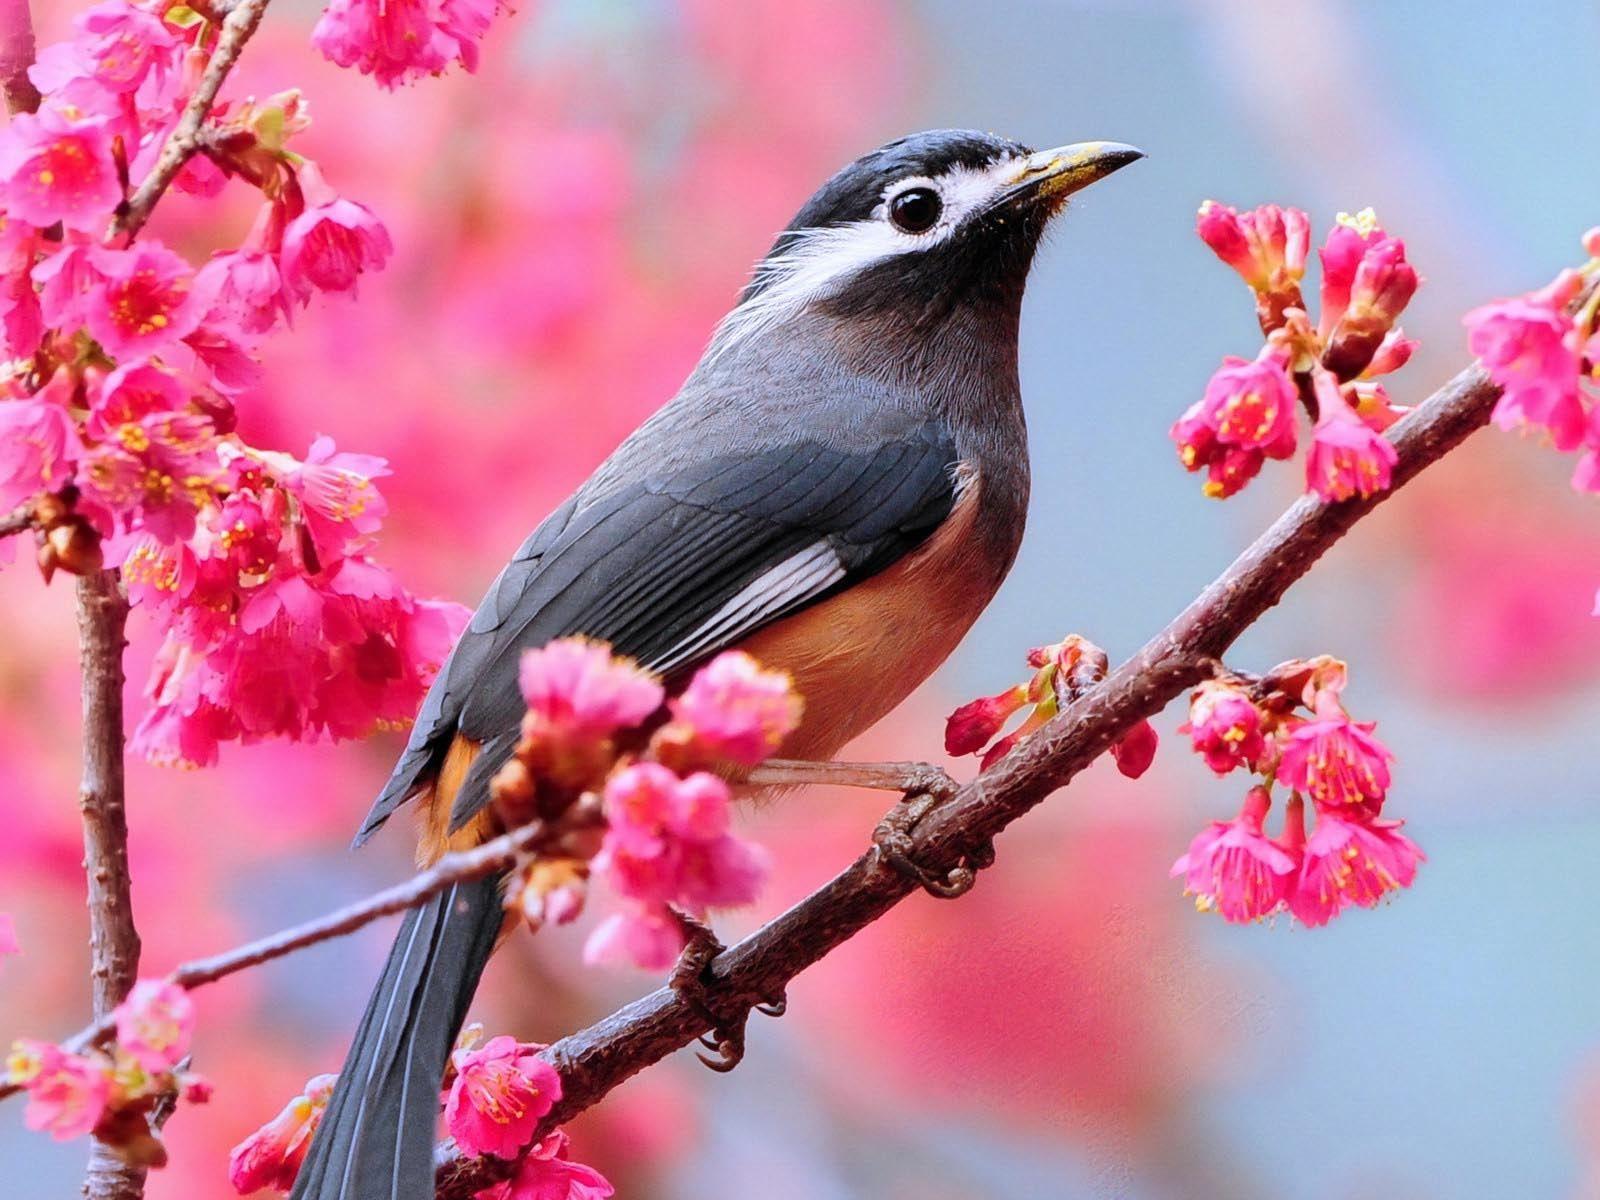 Spring awakening flowers. Abundant of watercolors pop! Pastel dreams and birds in the spring.